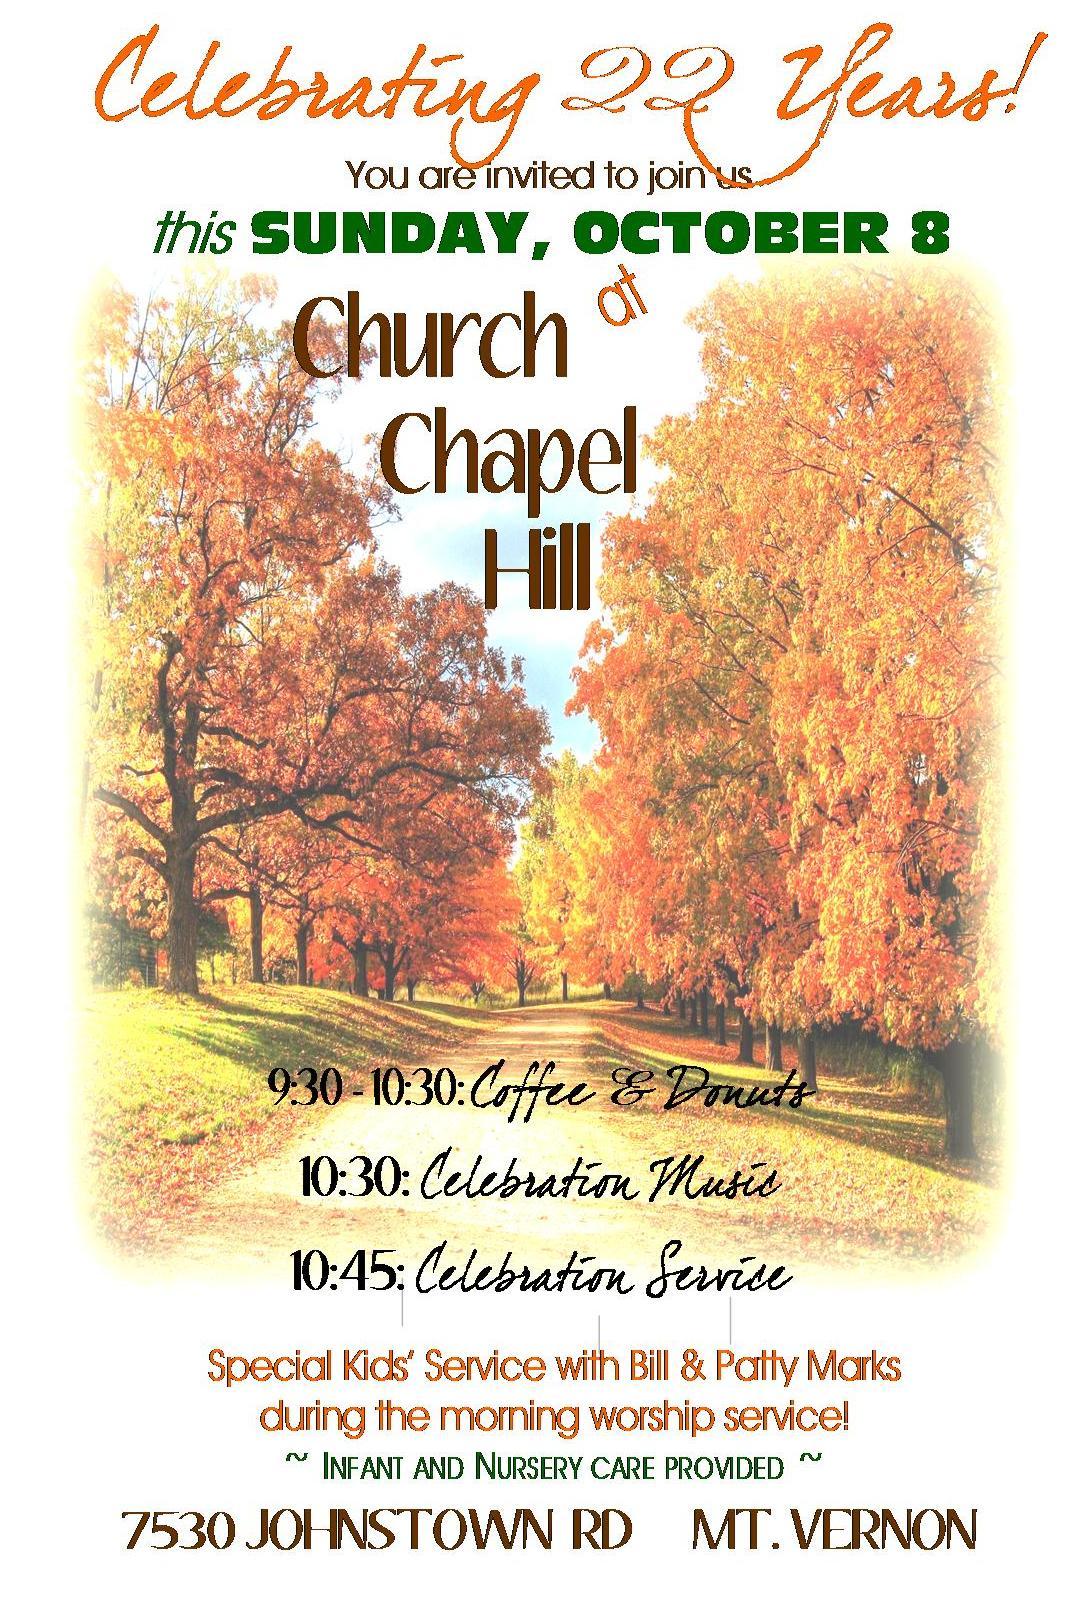 anniversary ad for church website 2017 church at chapel hill